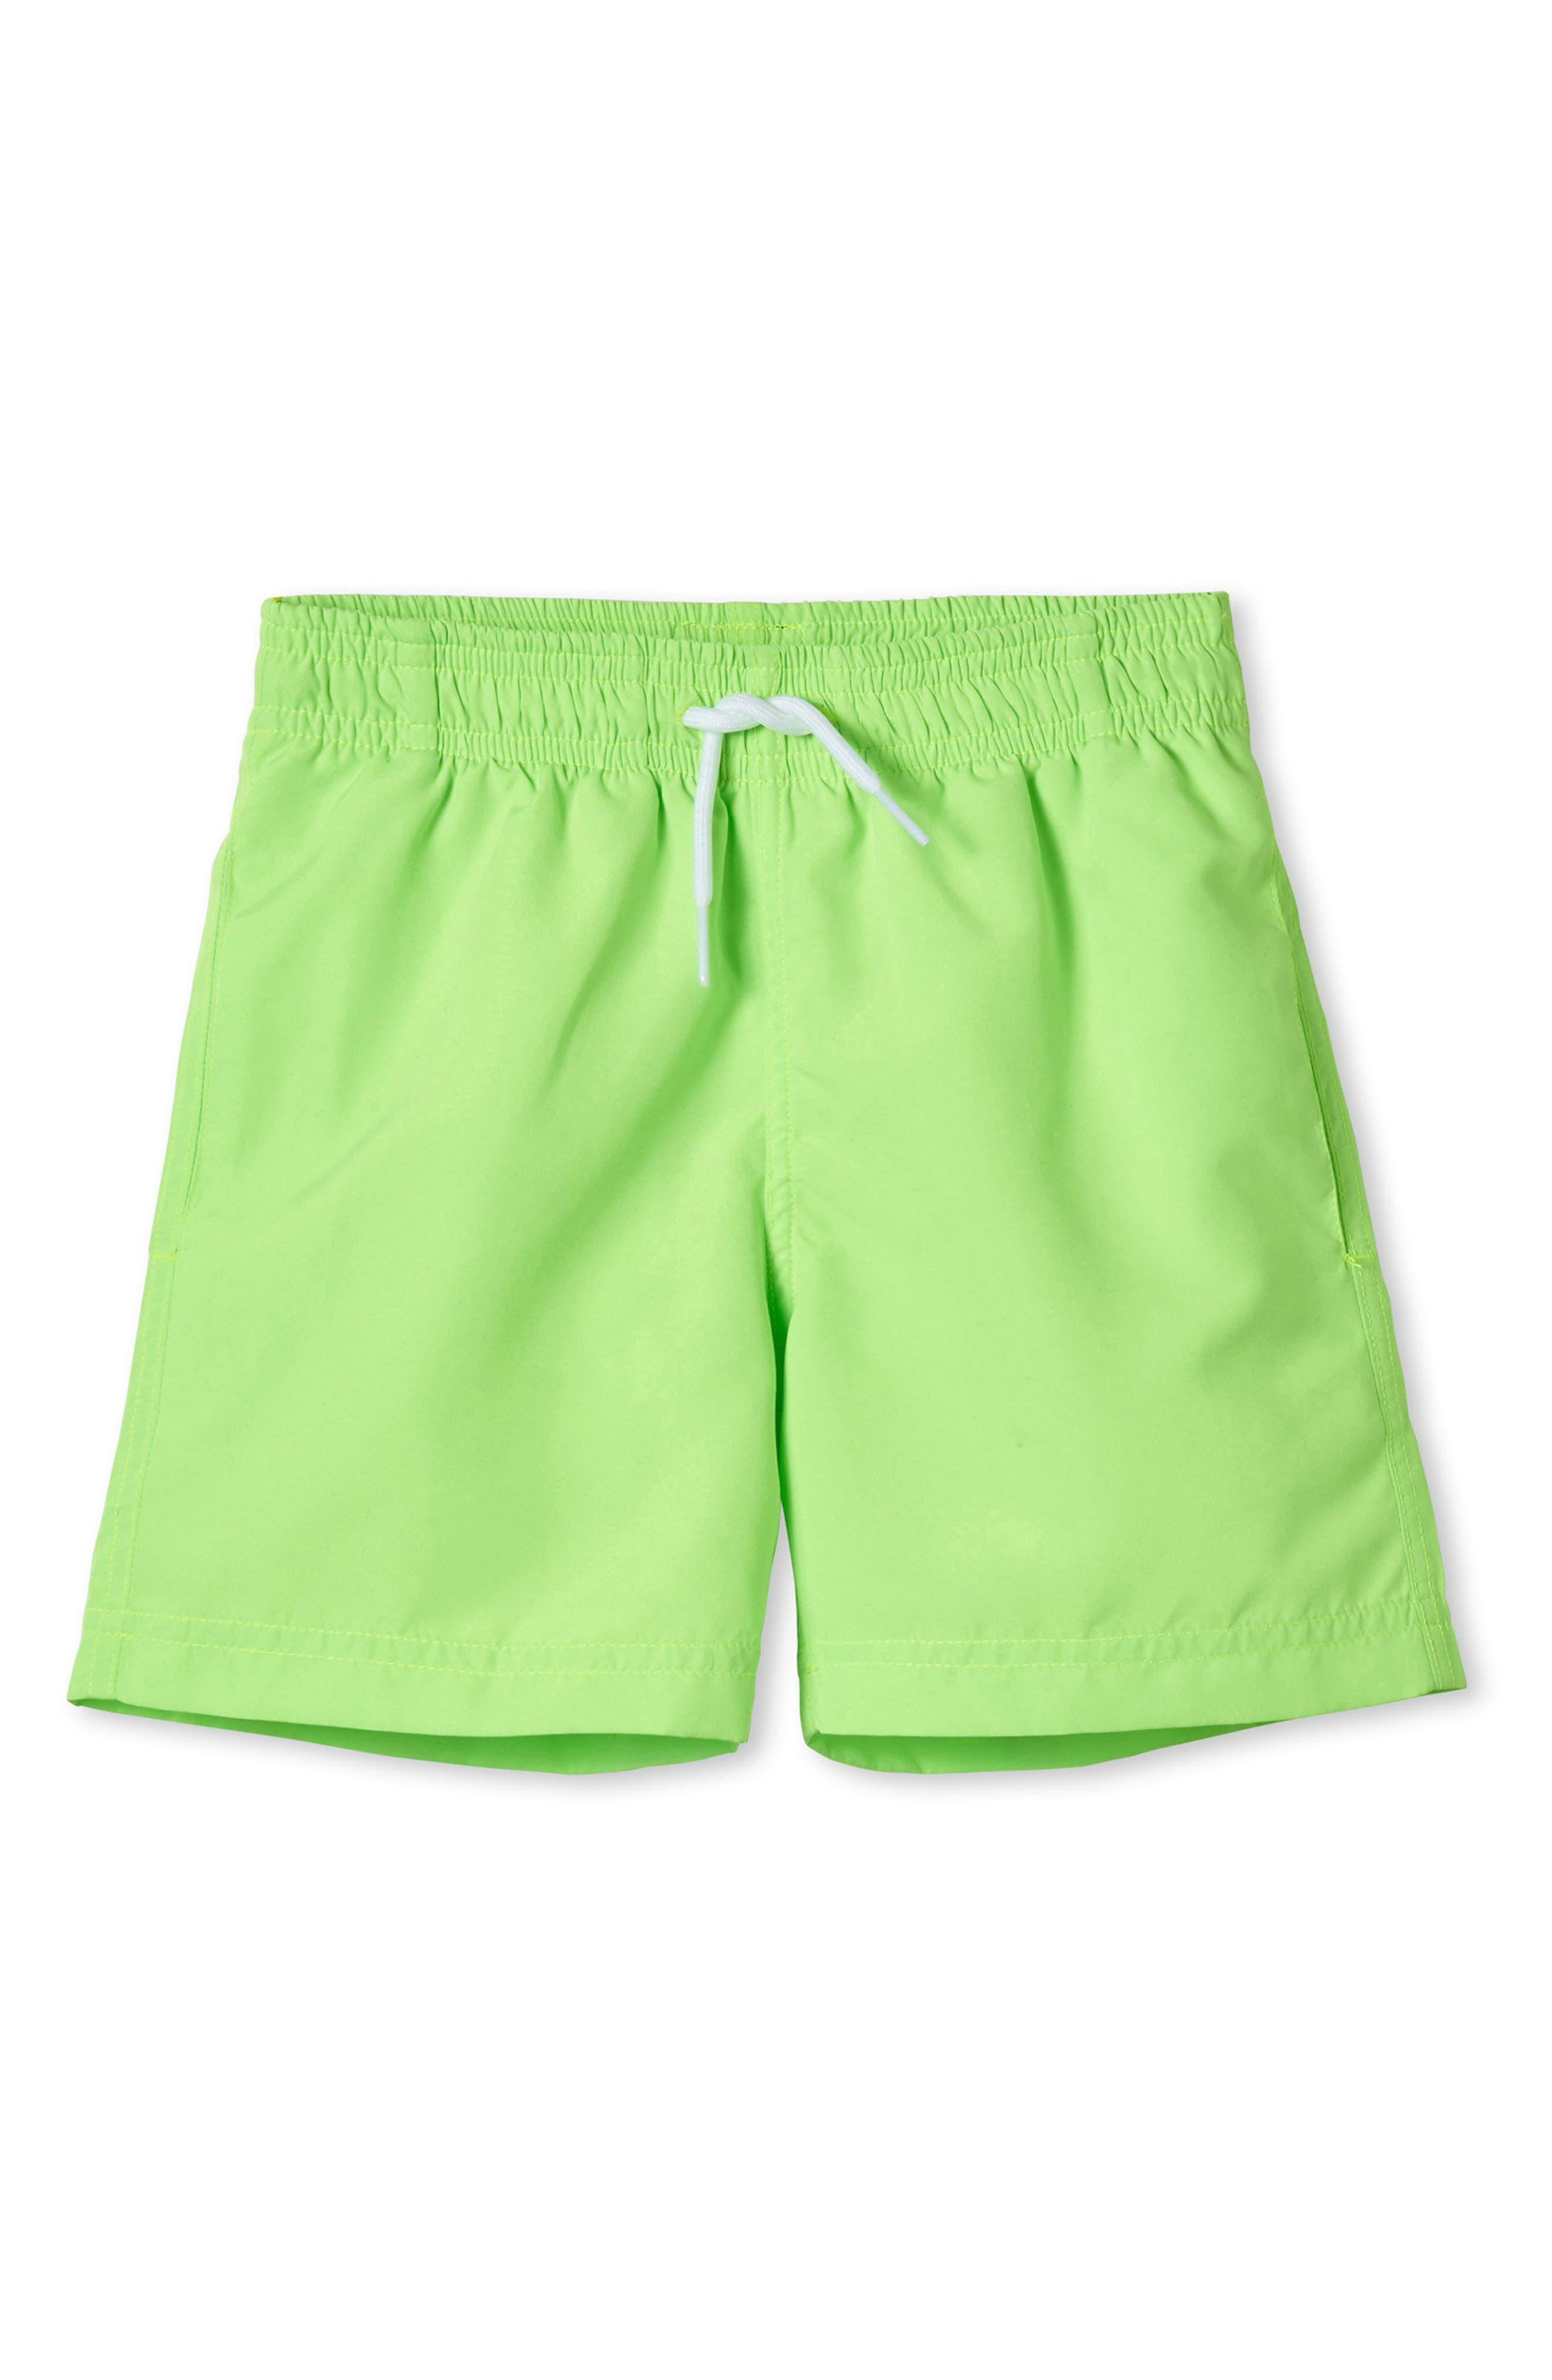 Stella Cove Neon Green Swim Trunks (Toddler Boys, Little Boys & Big Boys)